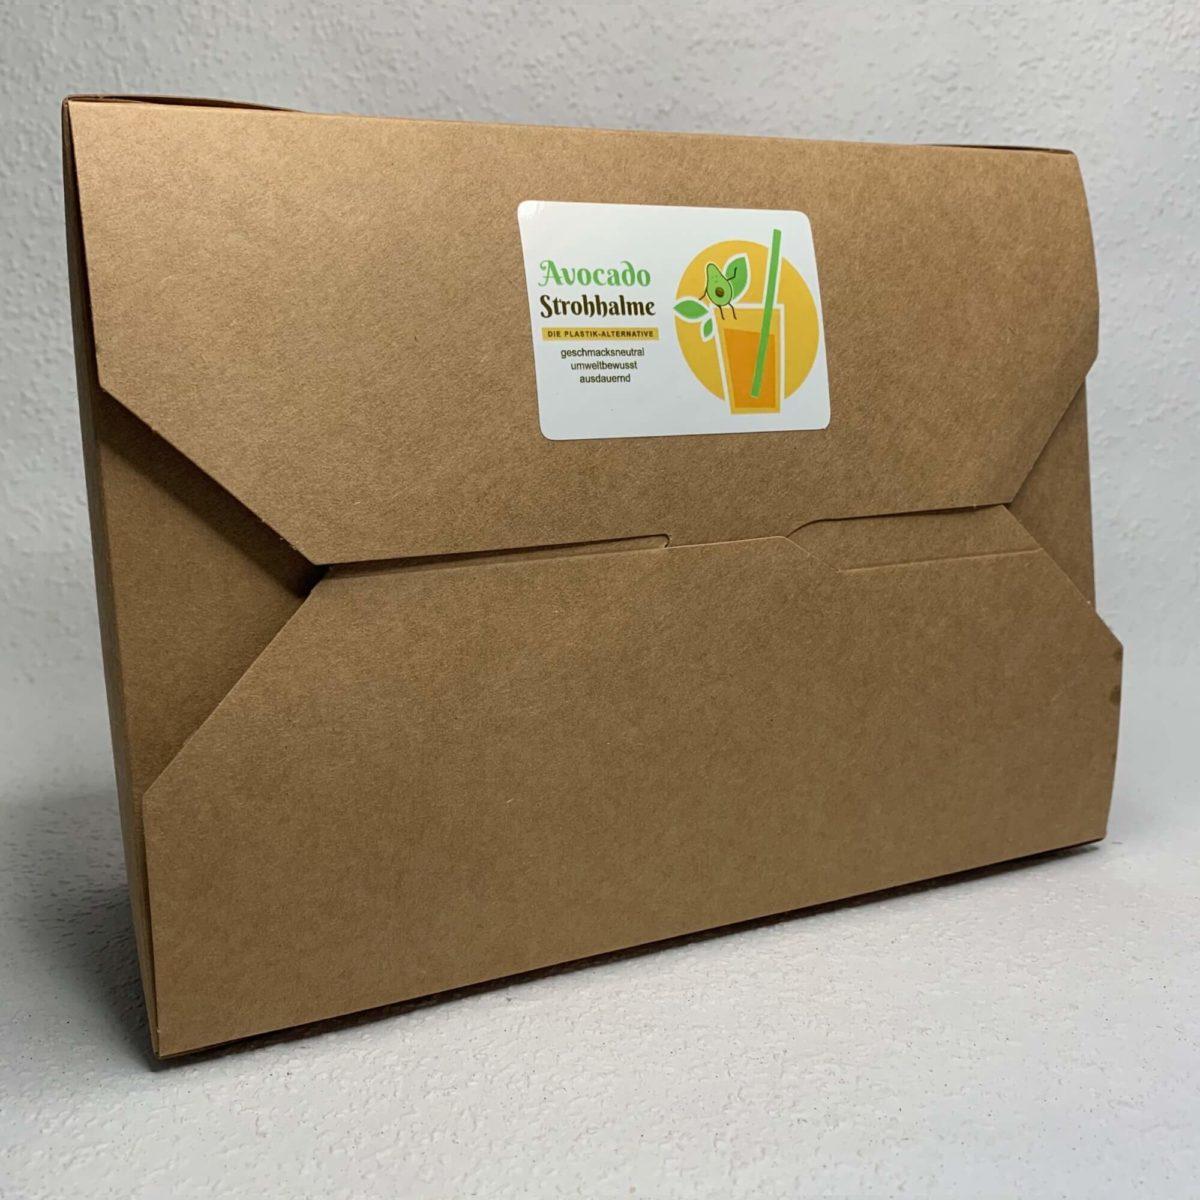 Praktische Avocado-Strohhalm Packung